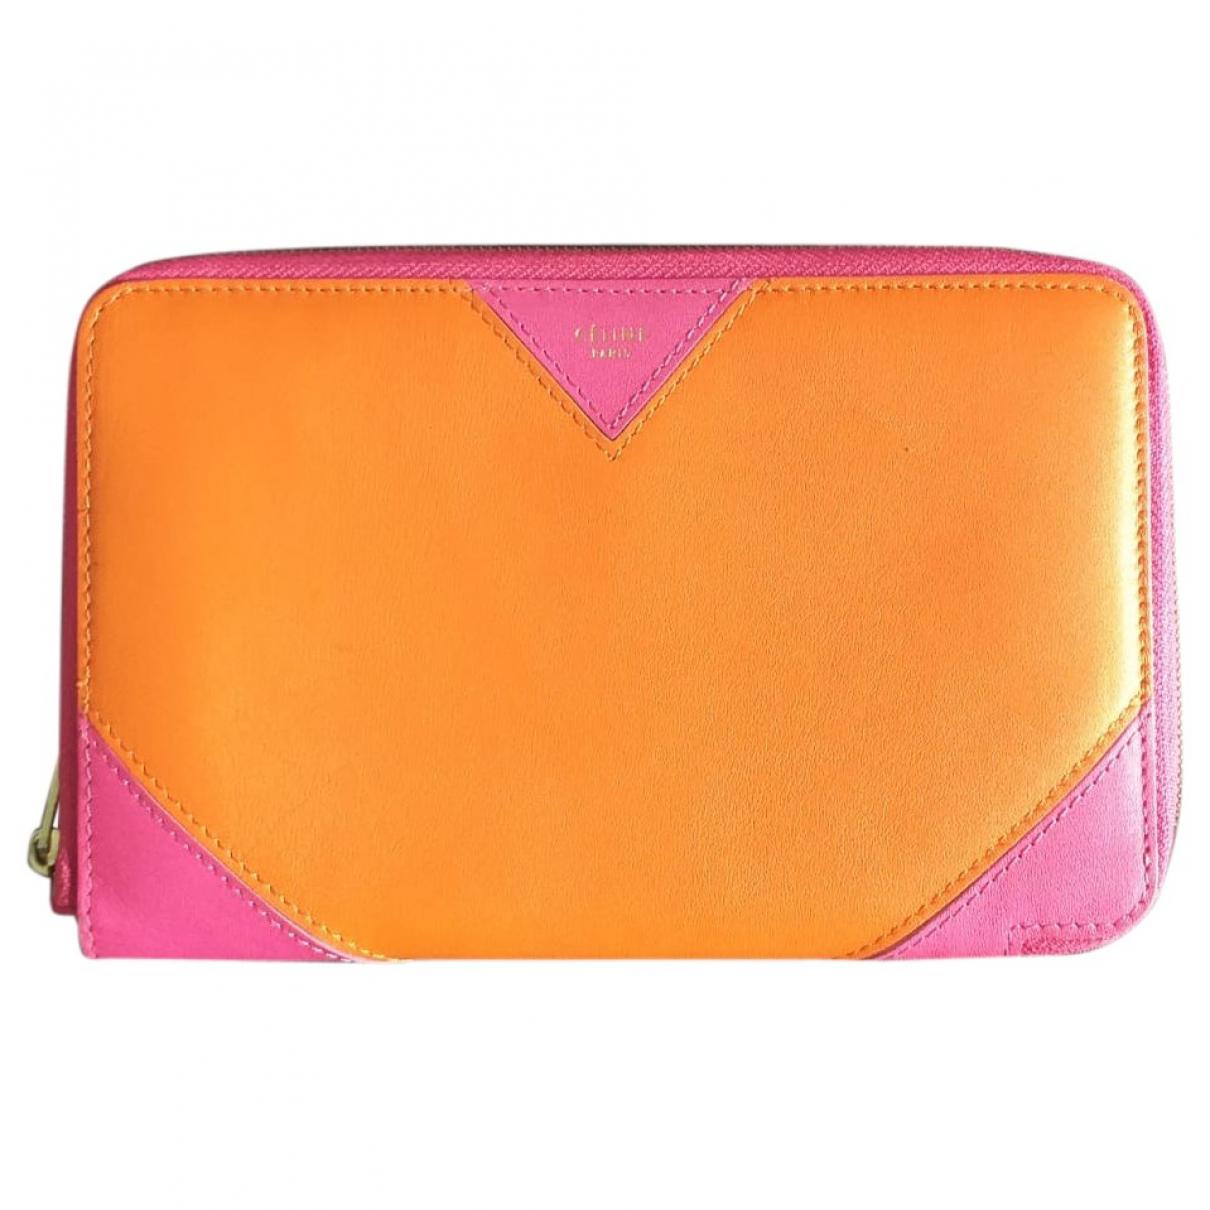 Celine \N Portemonnaie in  Orange Leder